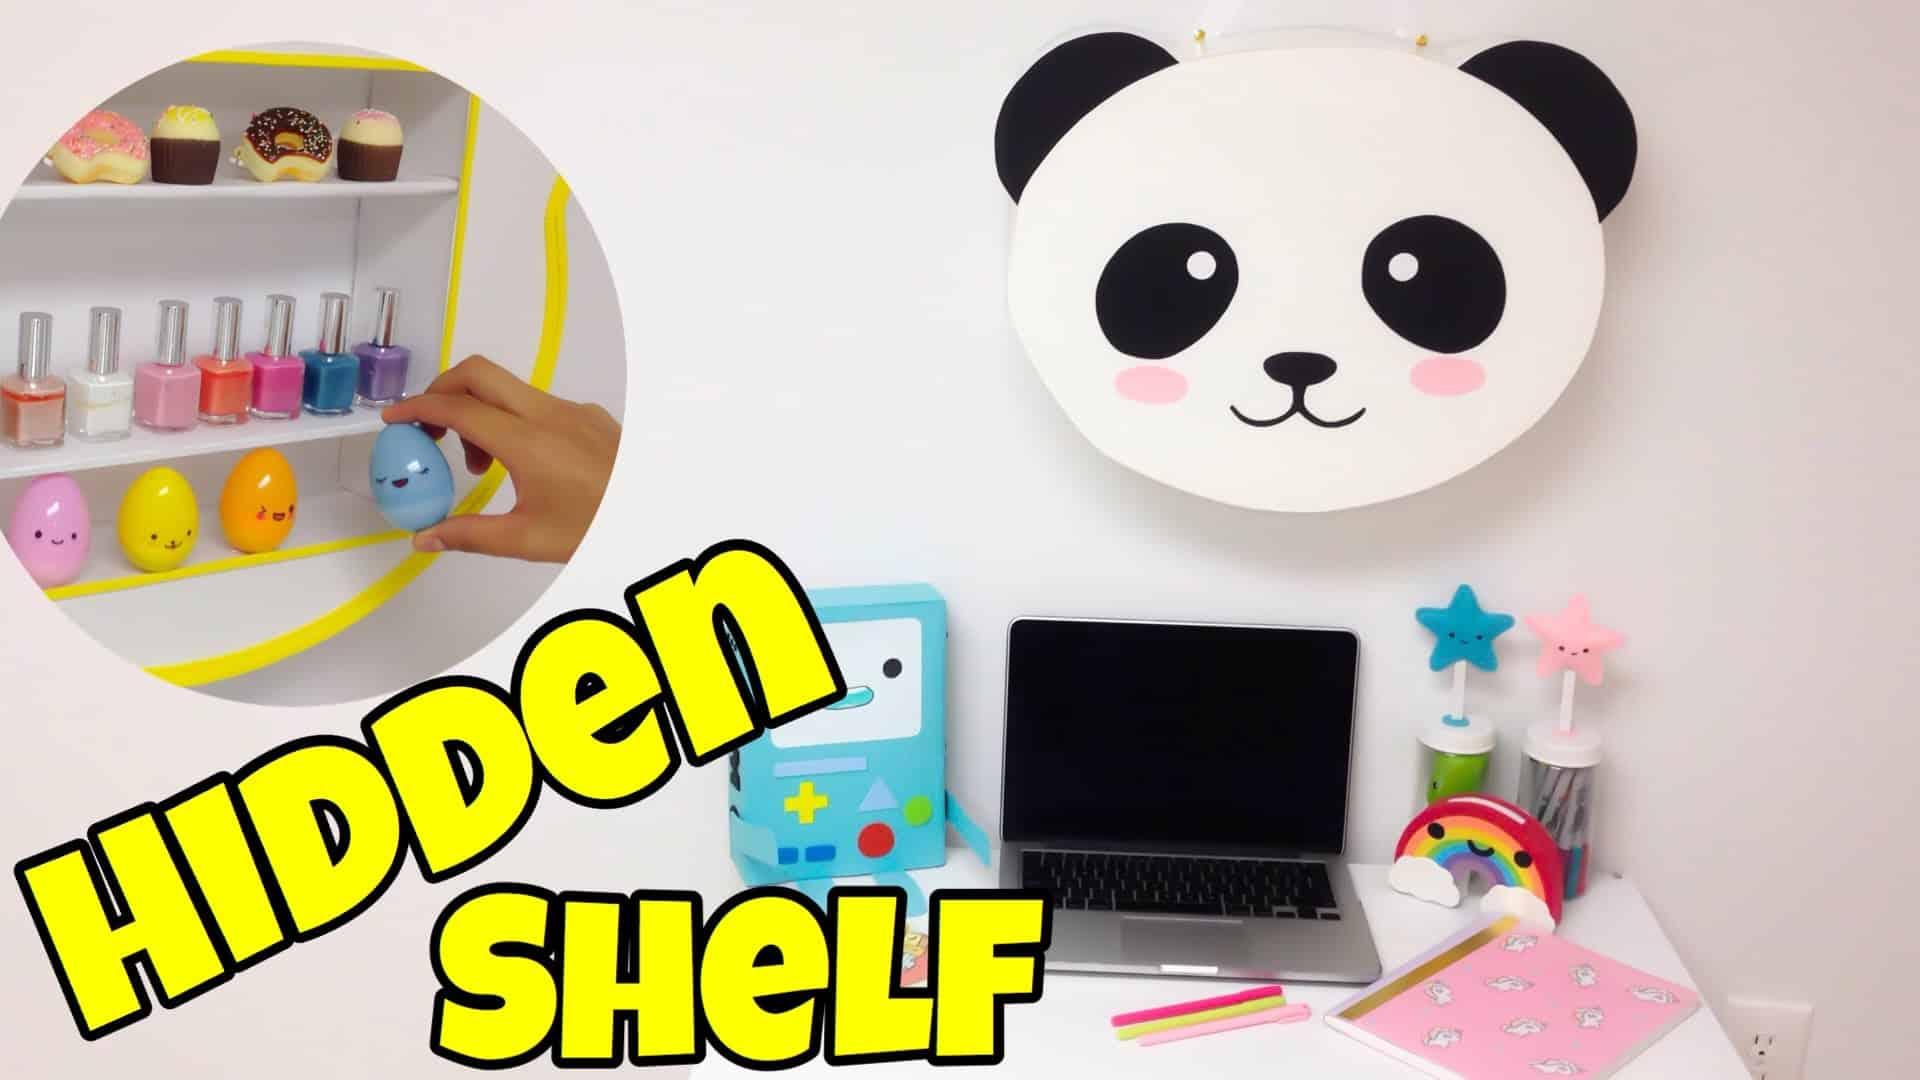 Kawaii panda hidden shelf